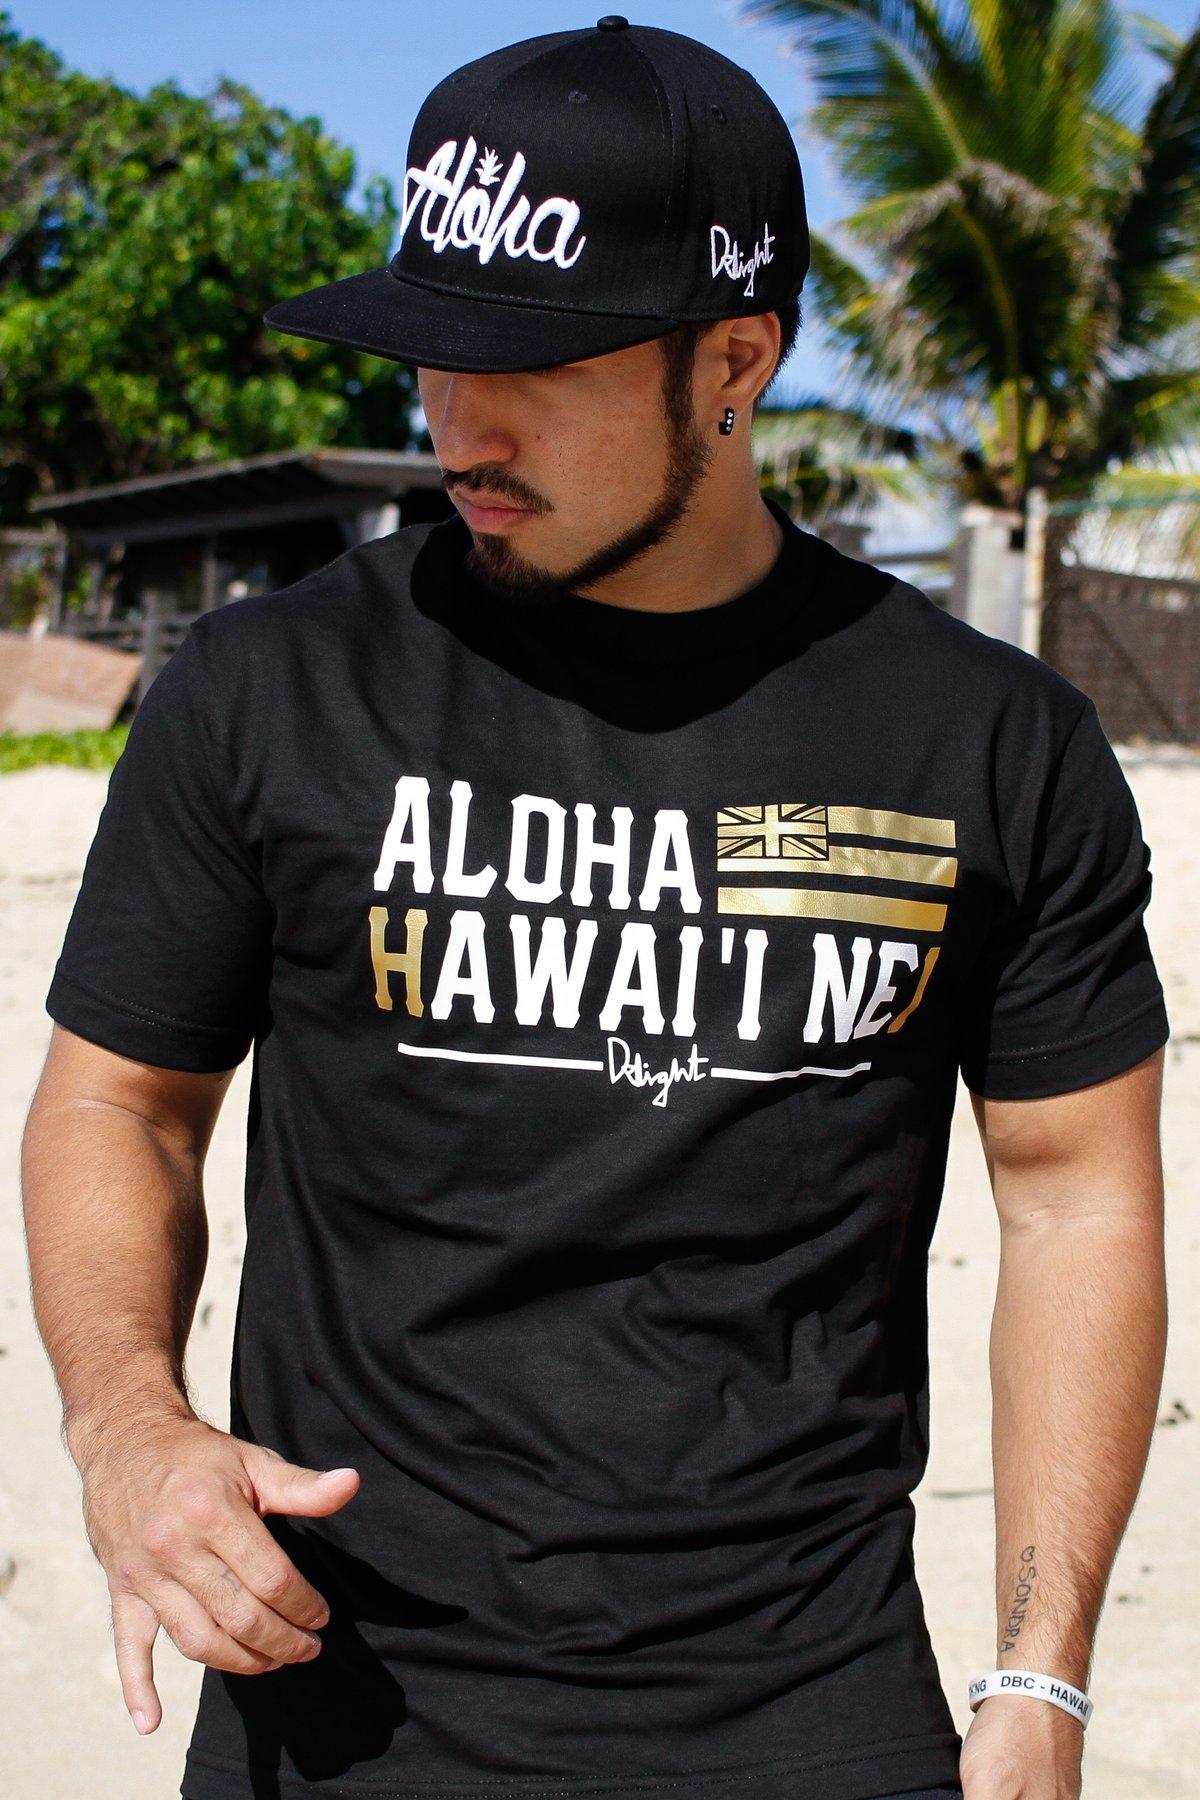 Aloha Hawai'i Nei Tee (Black/Gold)